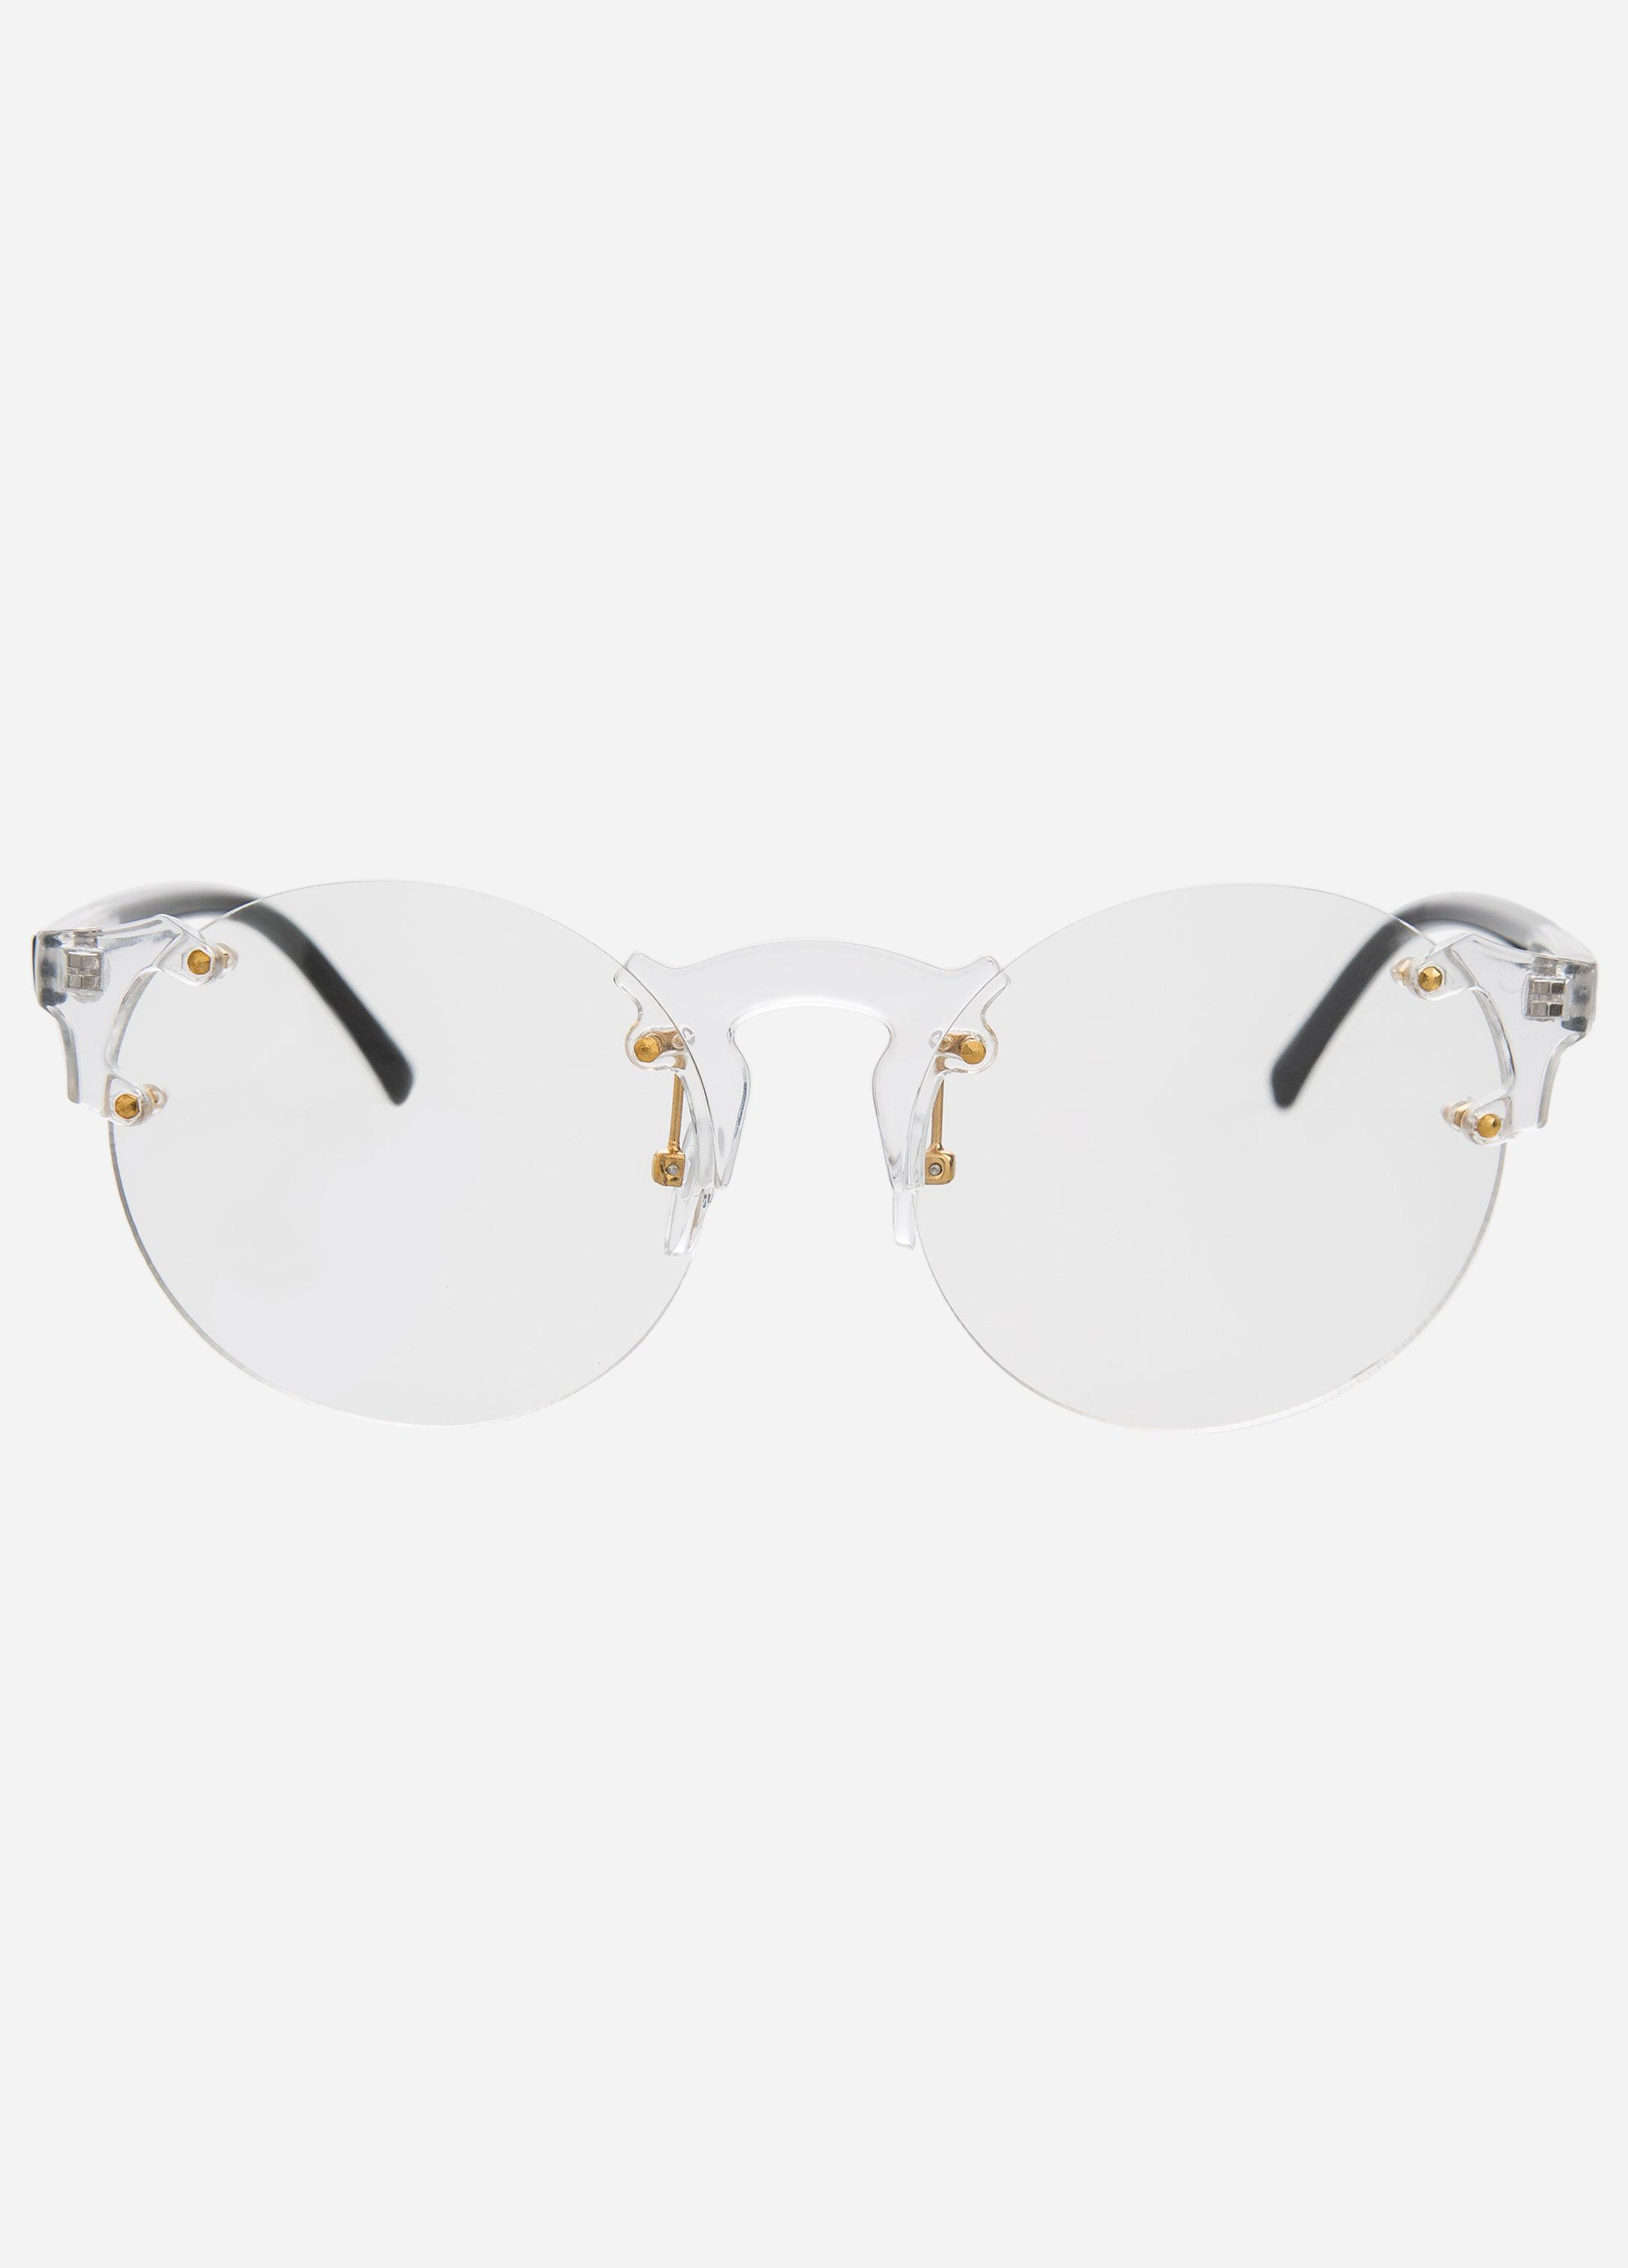 Lyst - Ashley Stewart Plastic Frame Clear Sunglasses in Gray